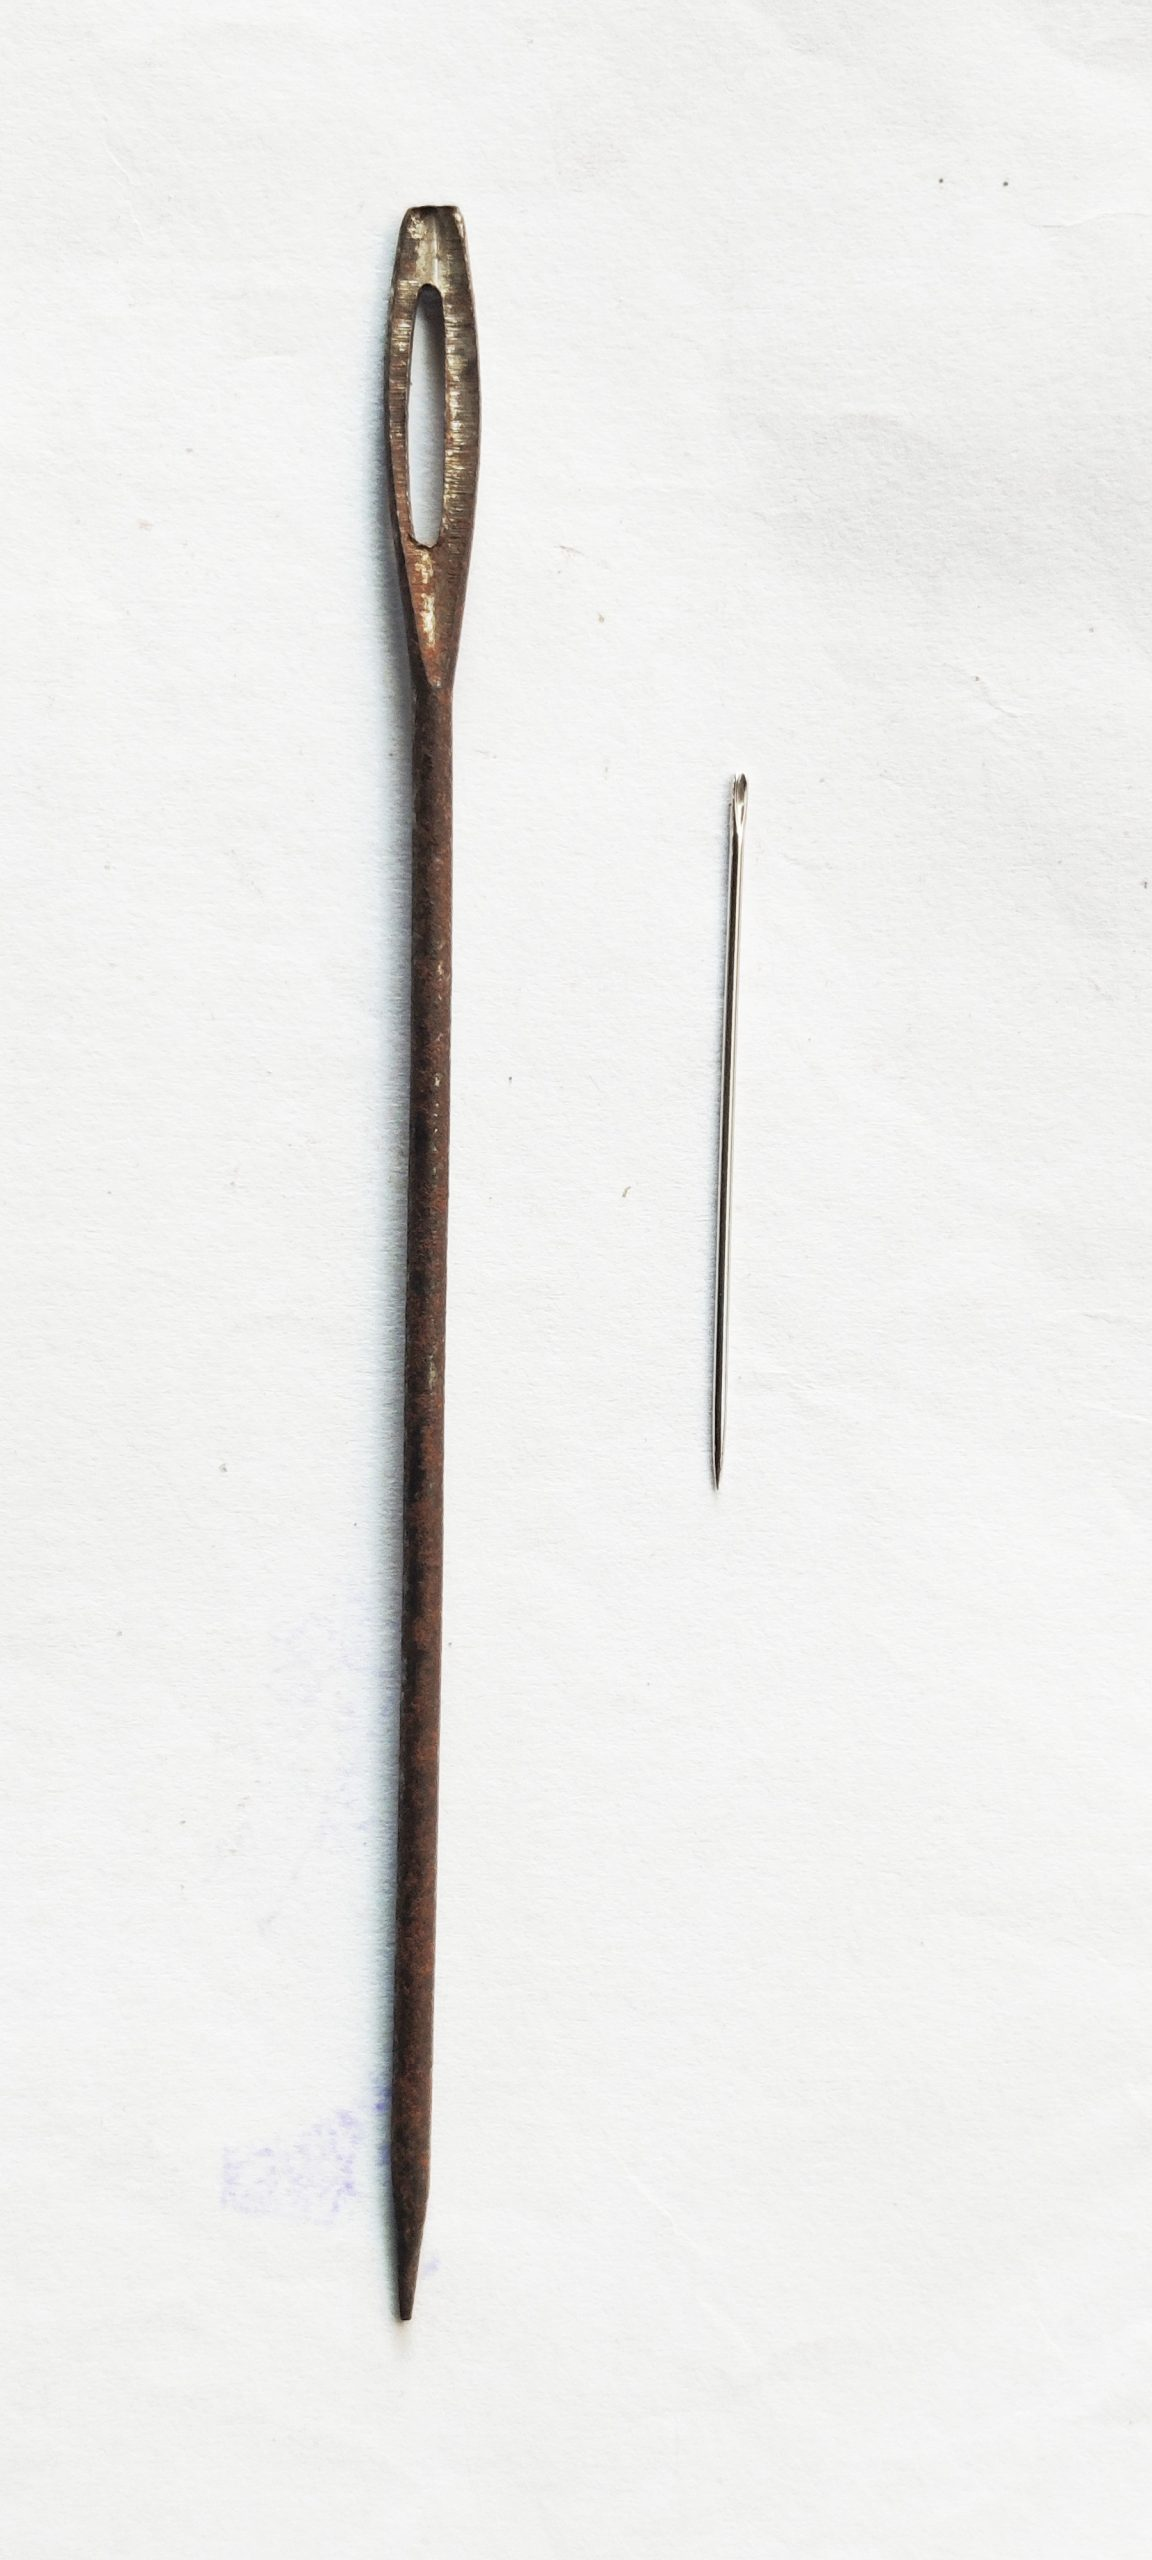 Stitching needles